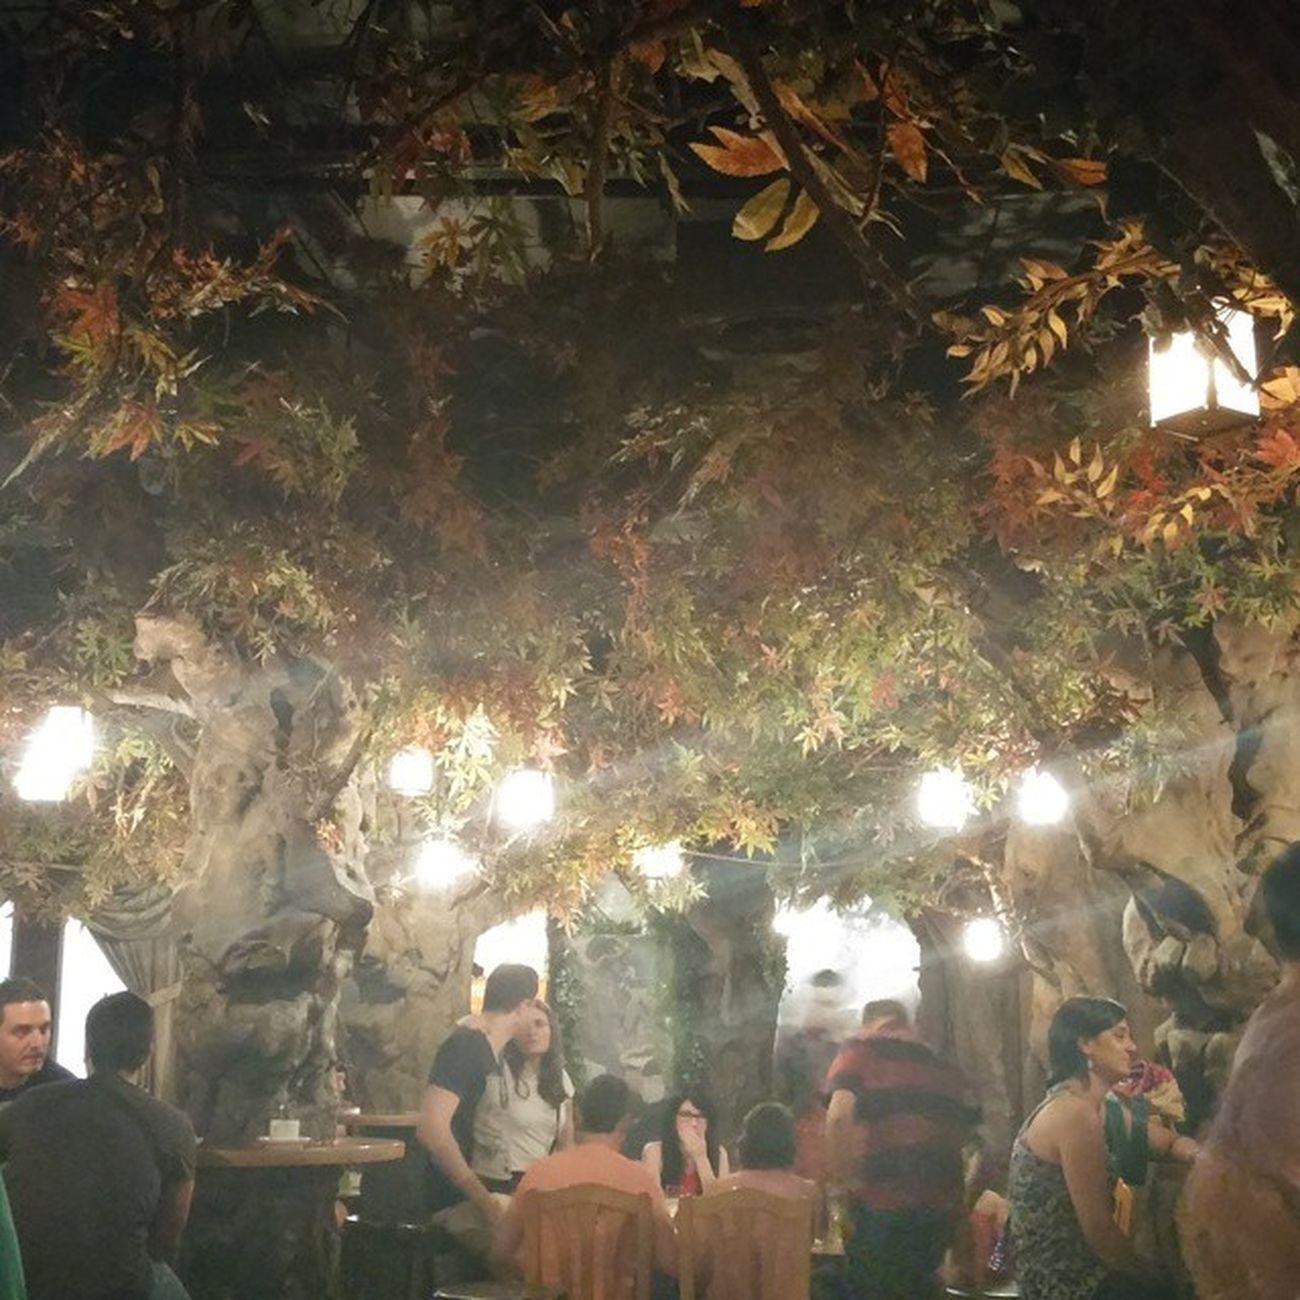 Elboscdelesfades Fairy Fairyforest Keiju Keijumetsä Barcelona Bcnexploradores Bcnexplorers Forestbar